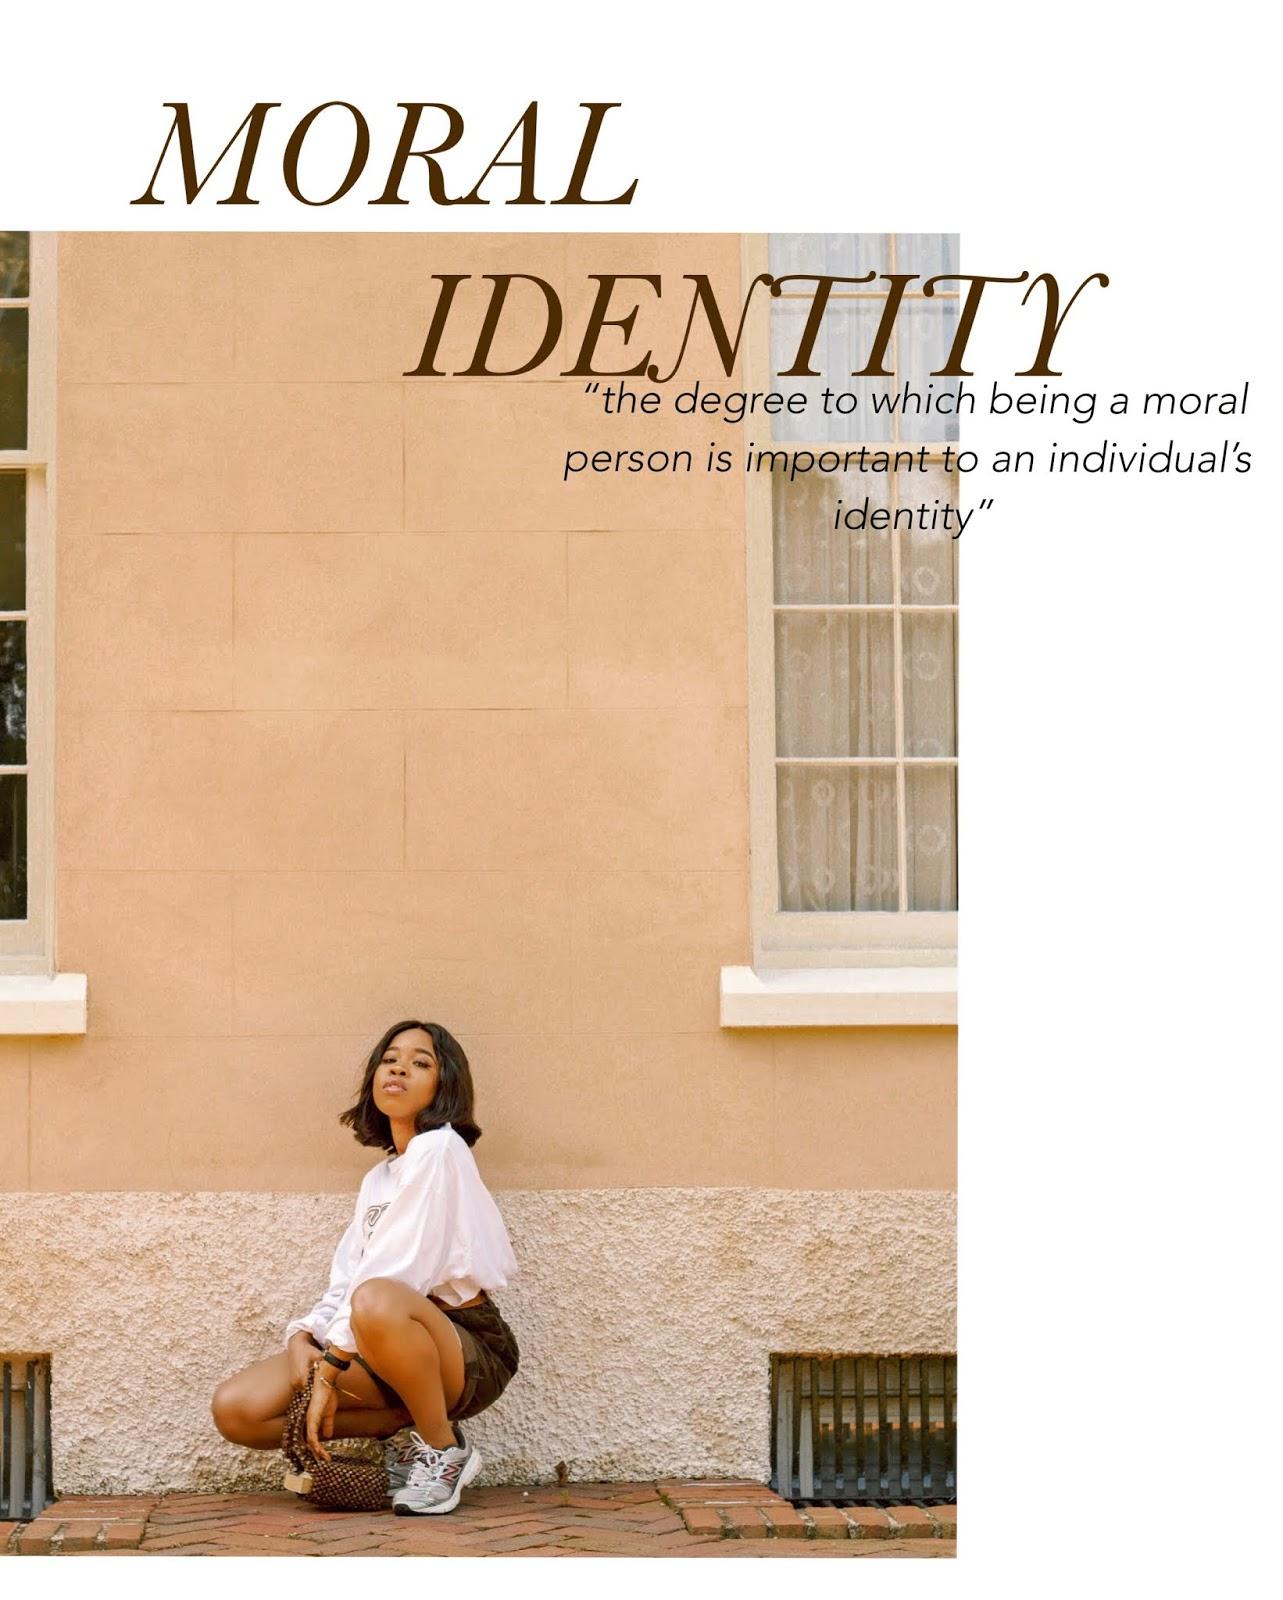 STRIKING A BALANCE BETWEEN MORAL IDENTITY AND MORAL ACTION